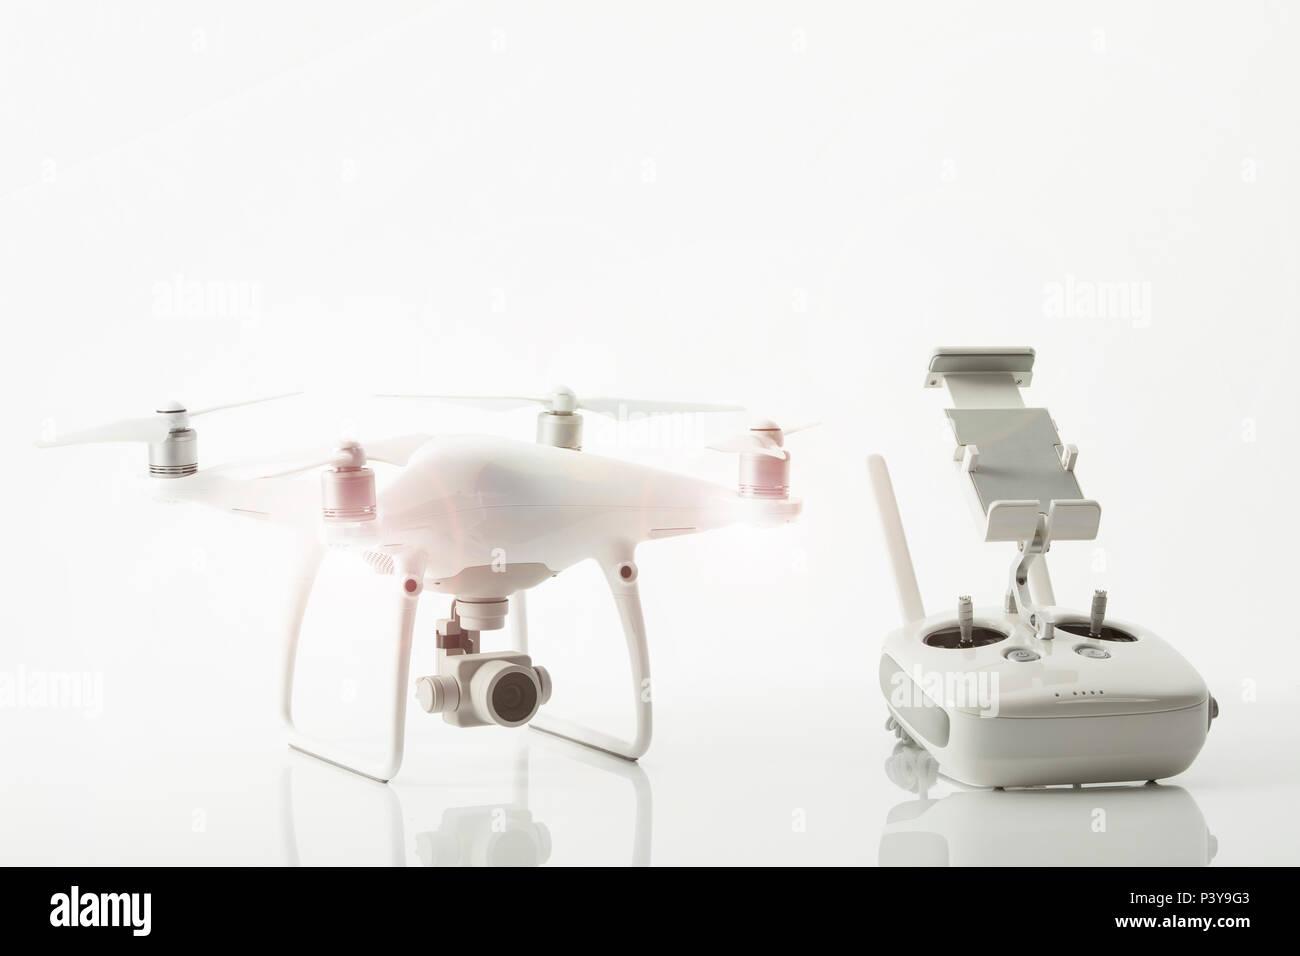 Drohne, Quadrocopter - Stock Image